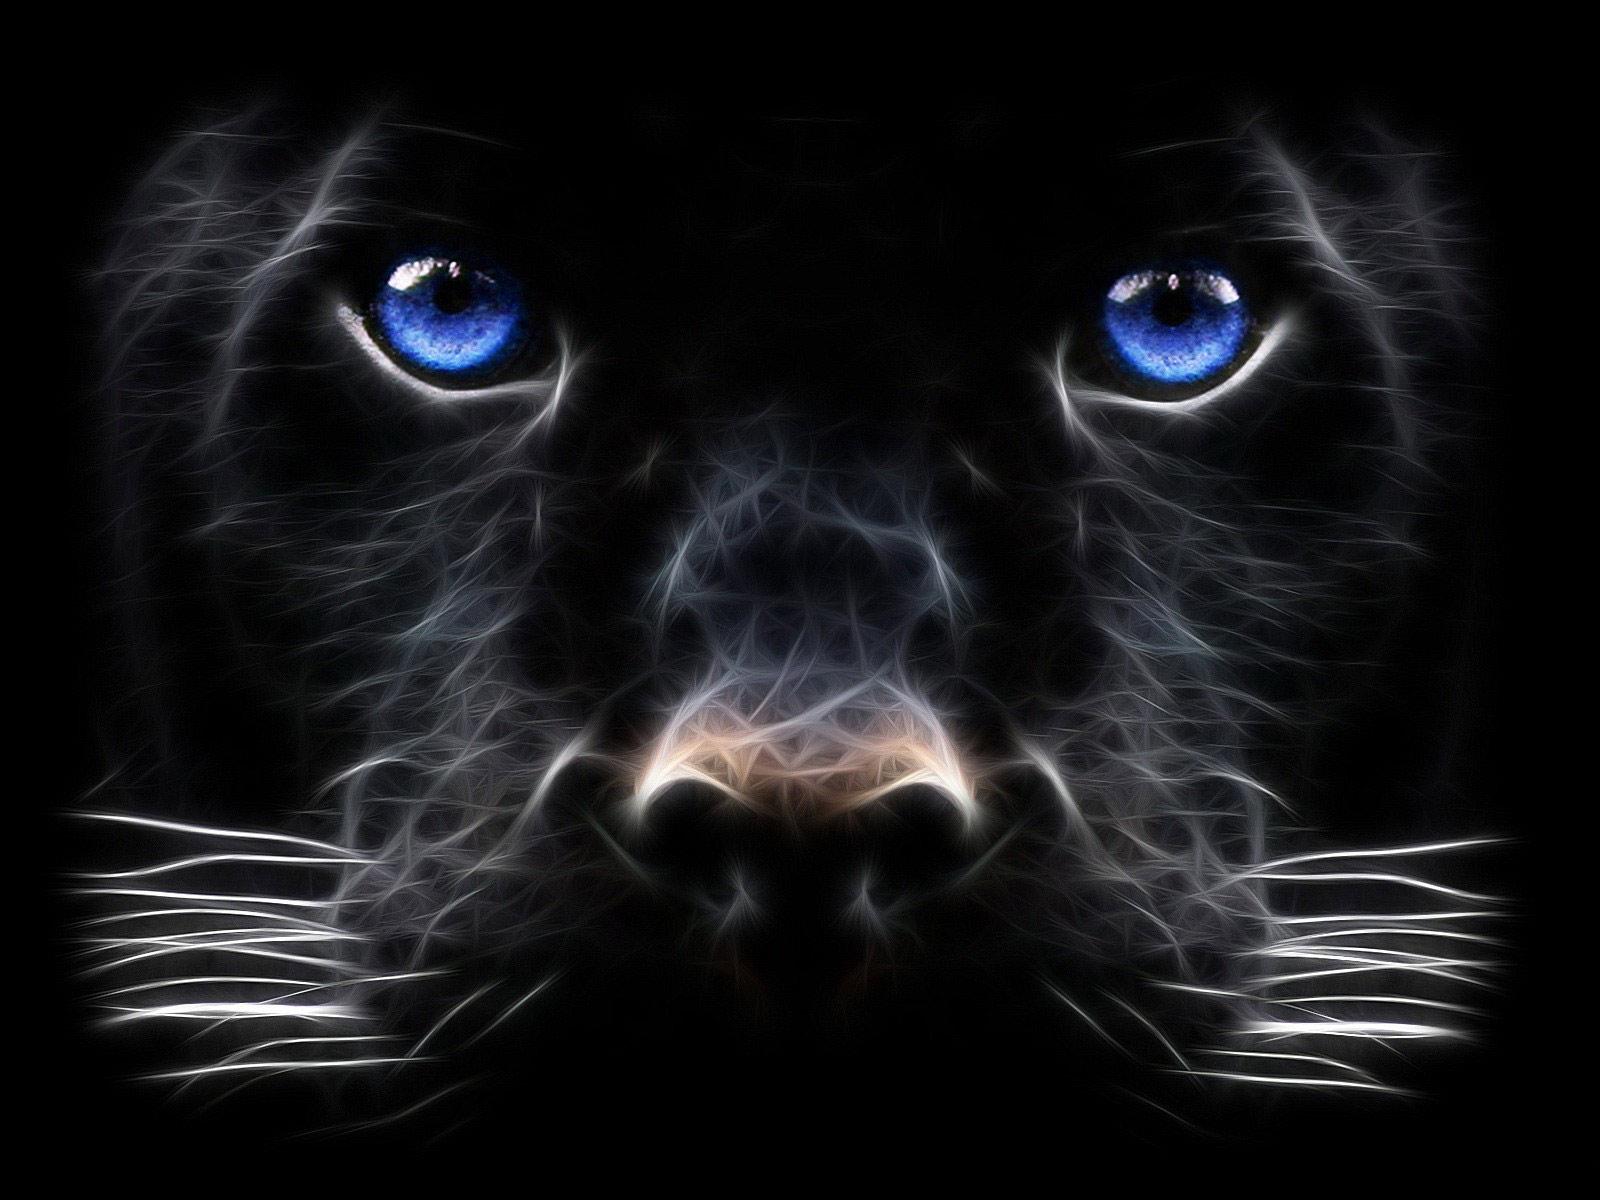 http://4.bp.blogspot.com/-JBC0Qz527eI/TdEmn98hJsI/AAAAAAAAH0g/6ZqiUV6lcLg/s1600/Backgrounds_Windows_7_-_Black_Panther%25252C_Big_cat.jpg